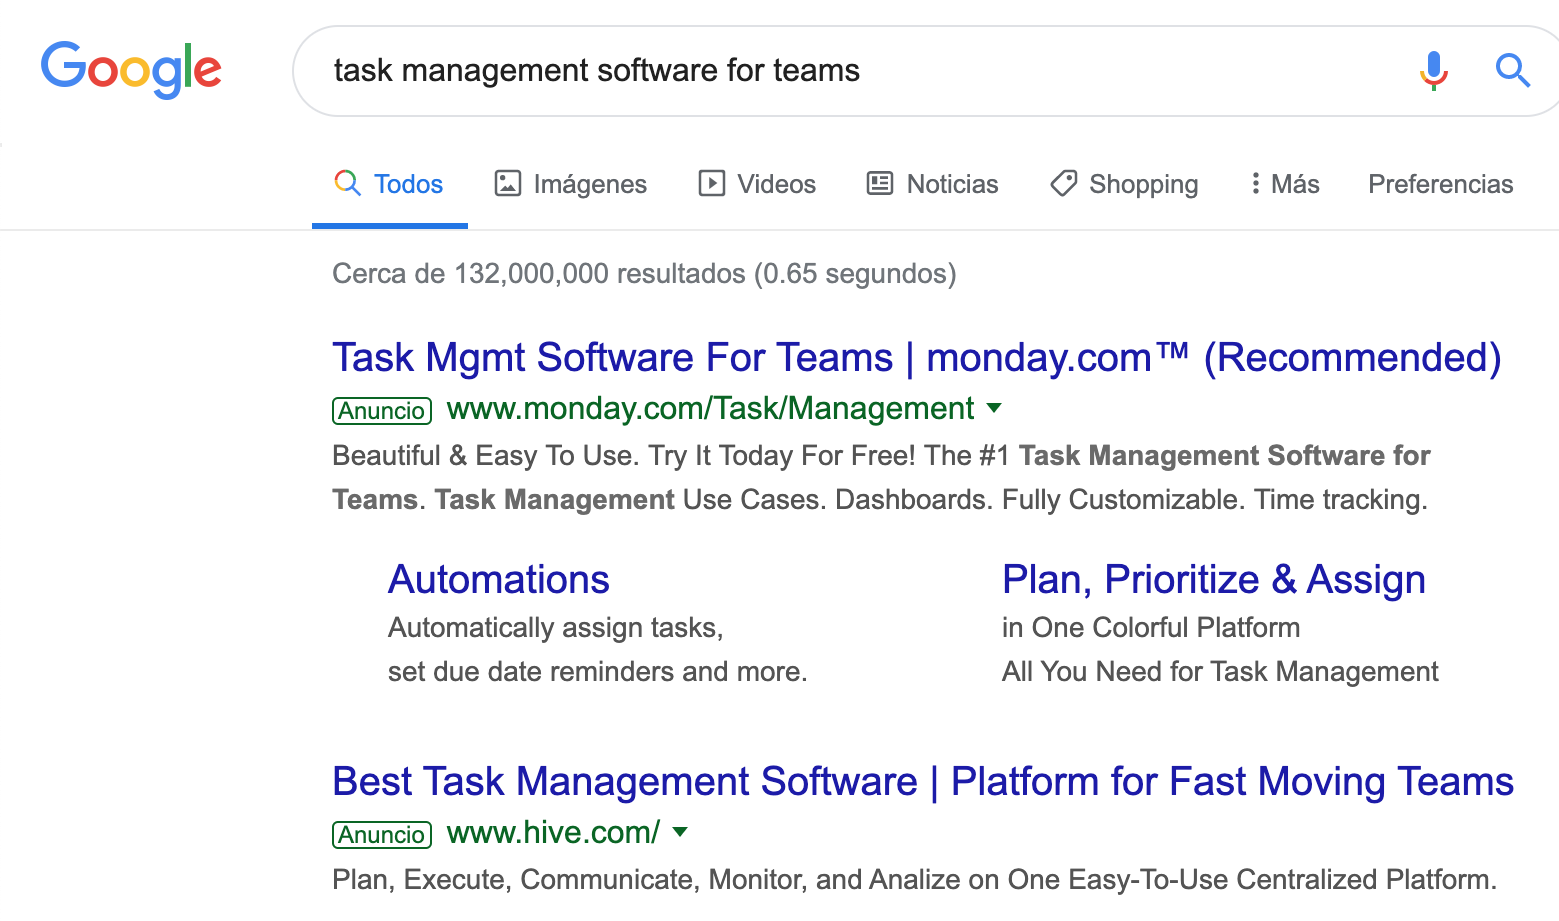 Google ad headline